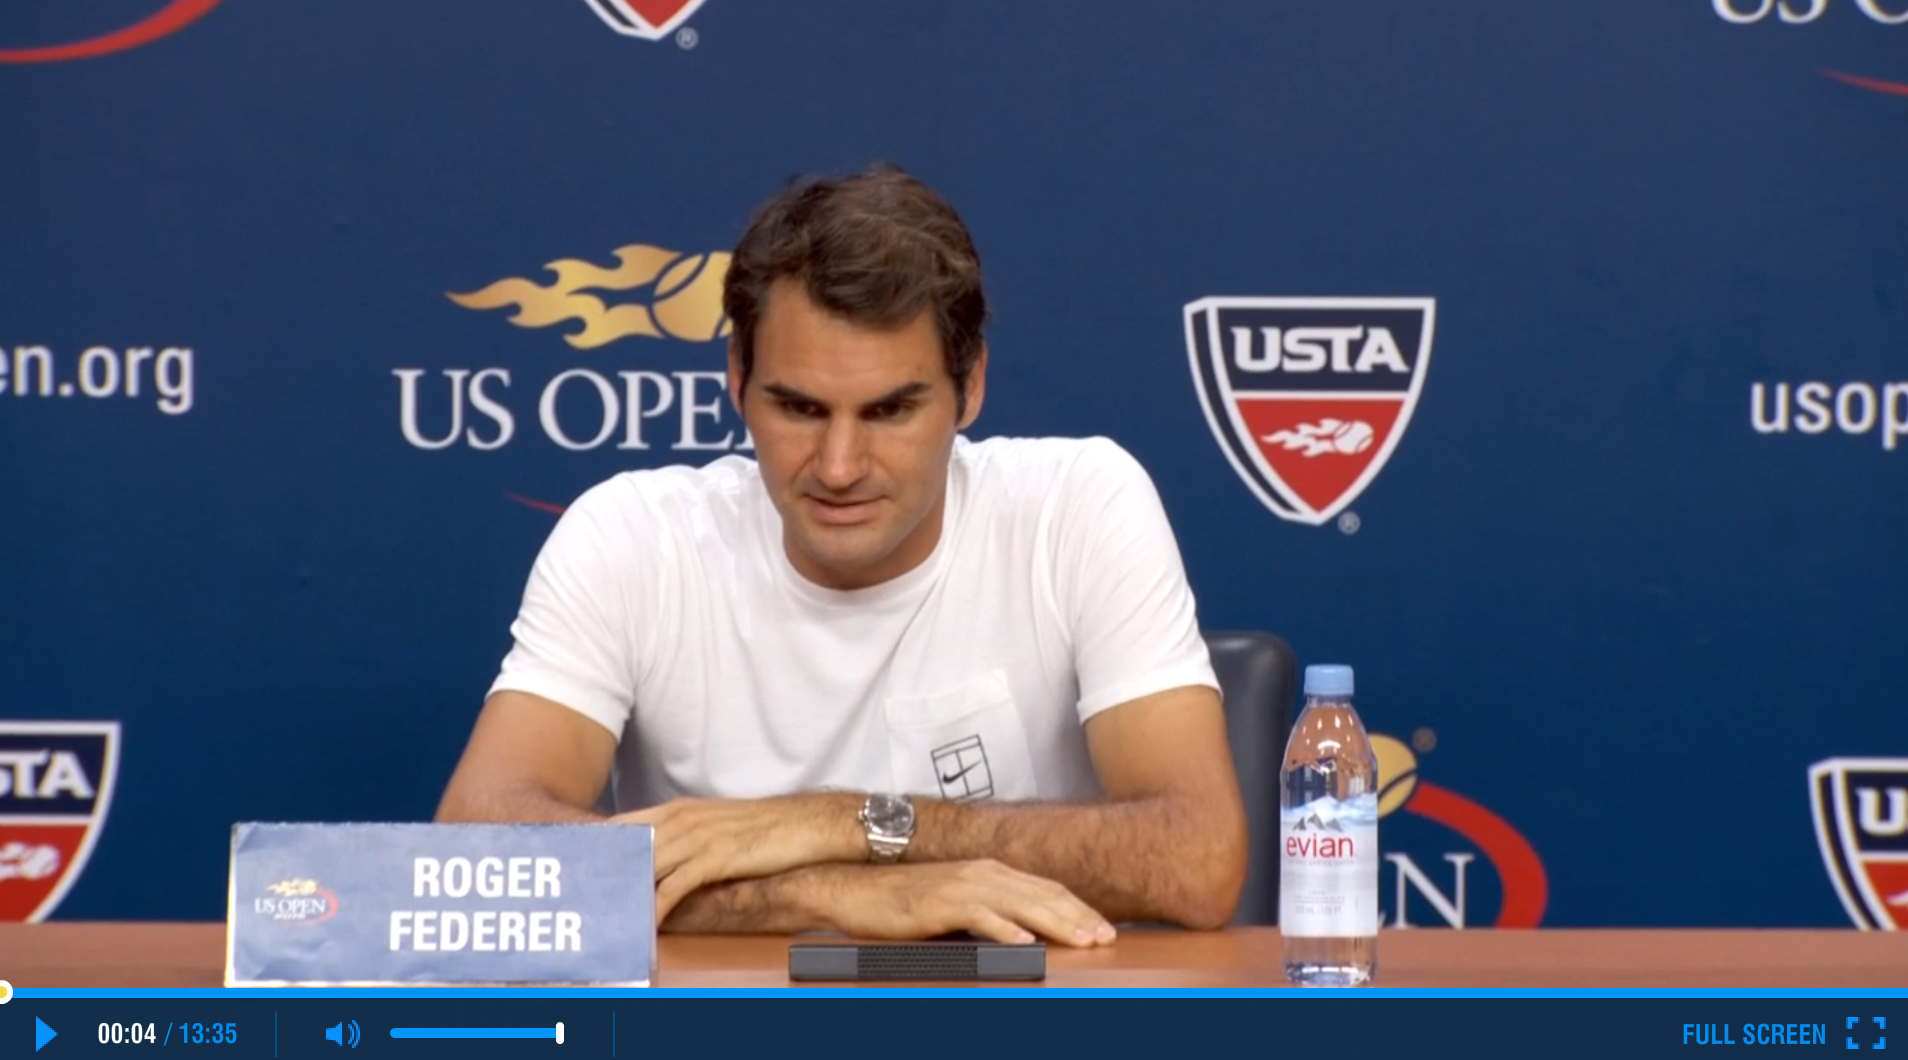 Federer 2015 US Open Semifinals Press Conference